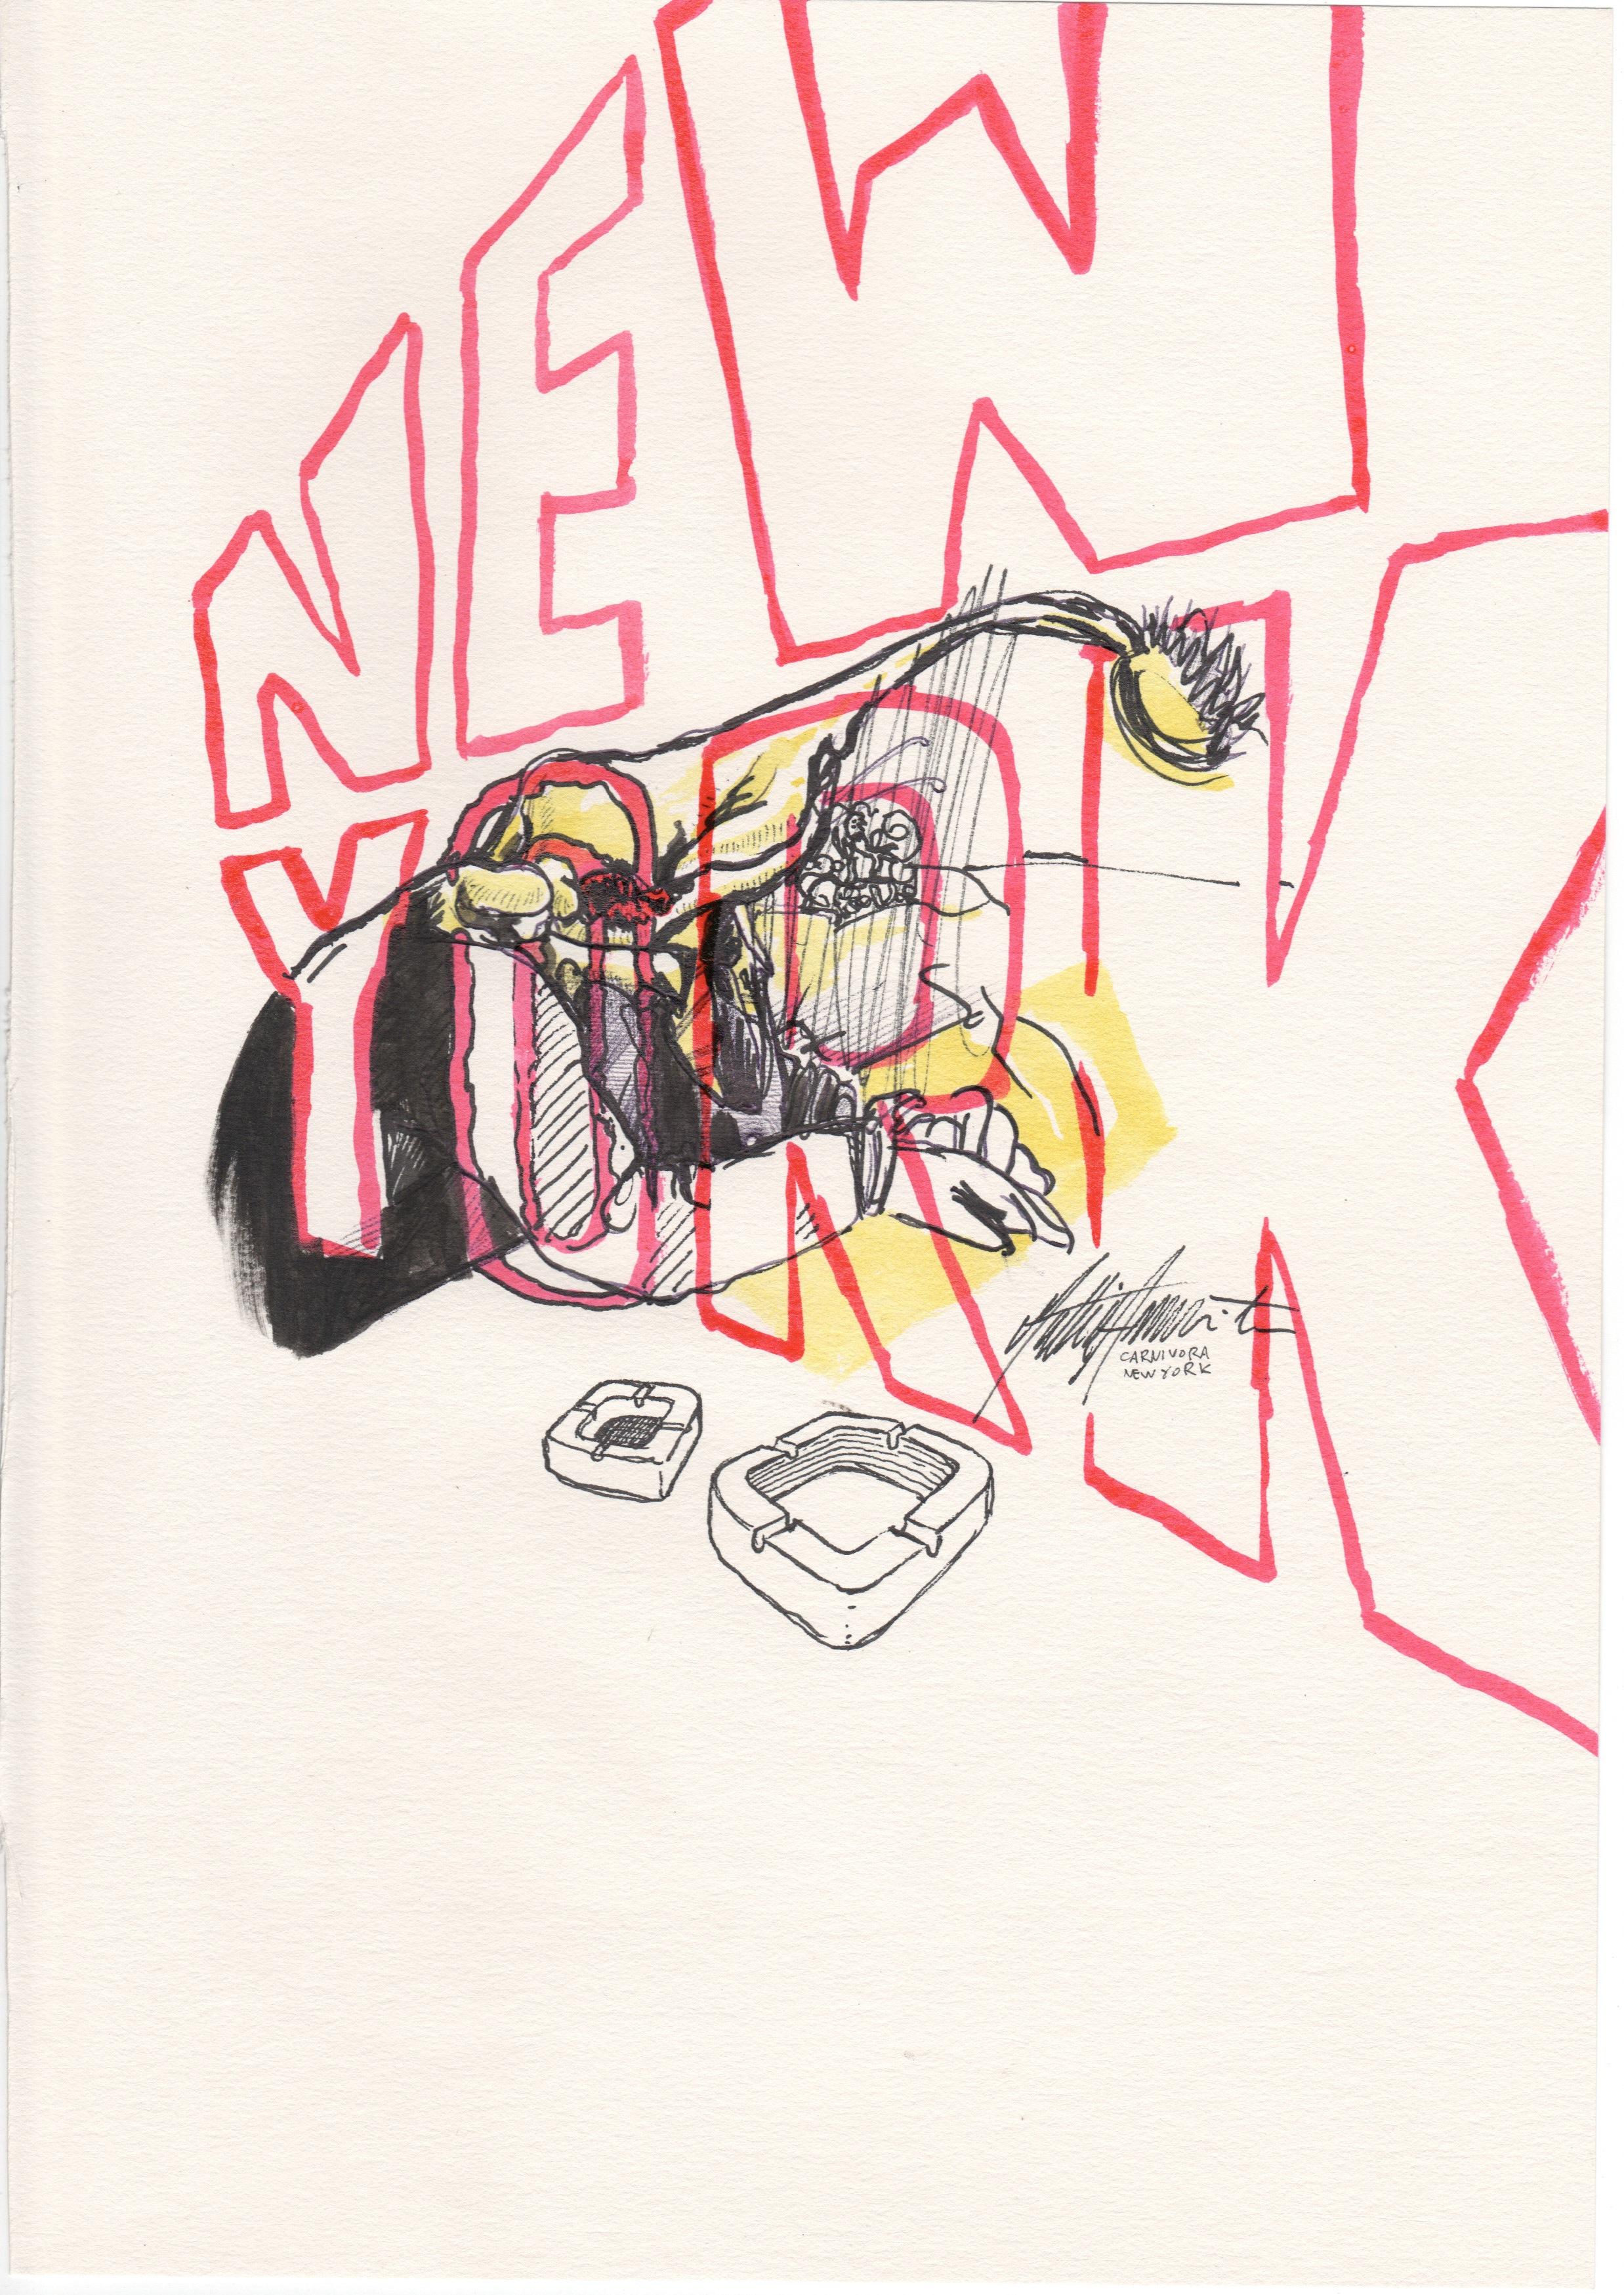 Carnivora New York